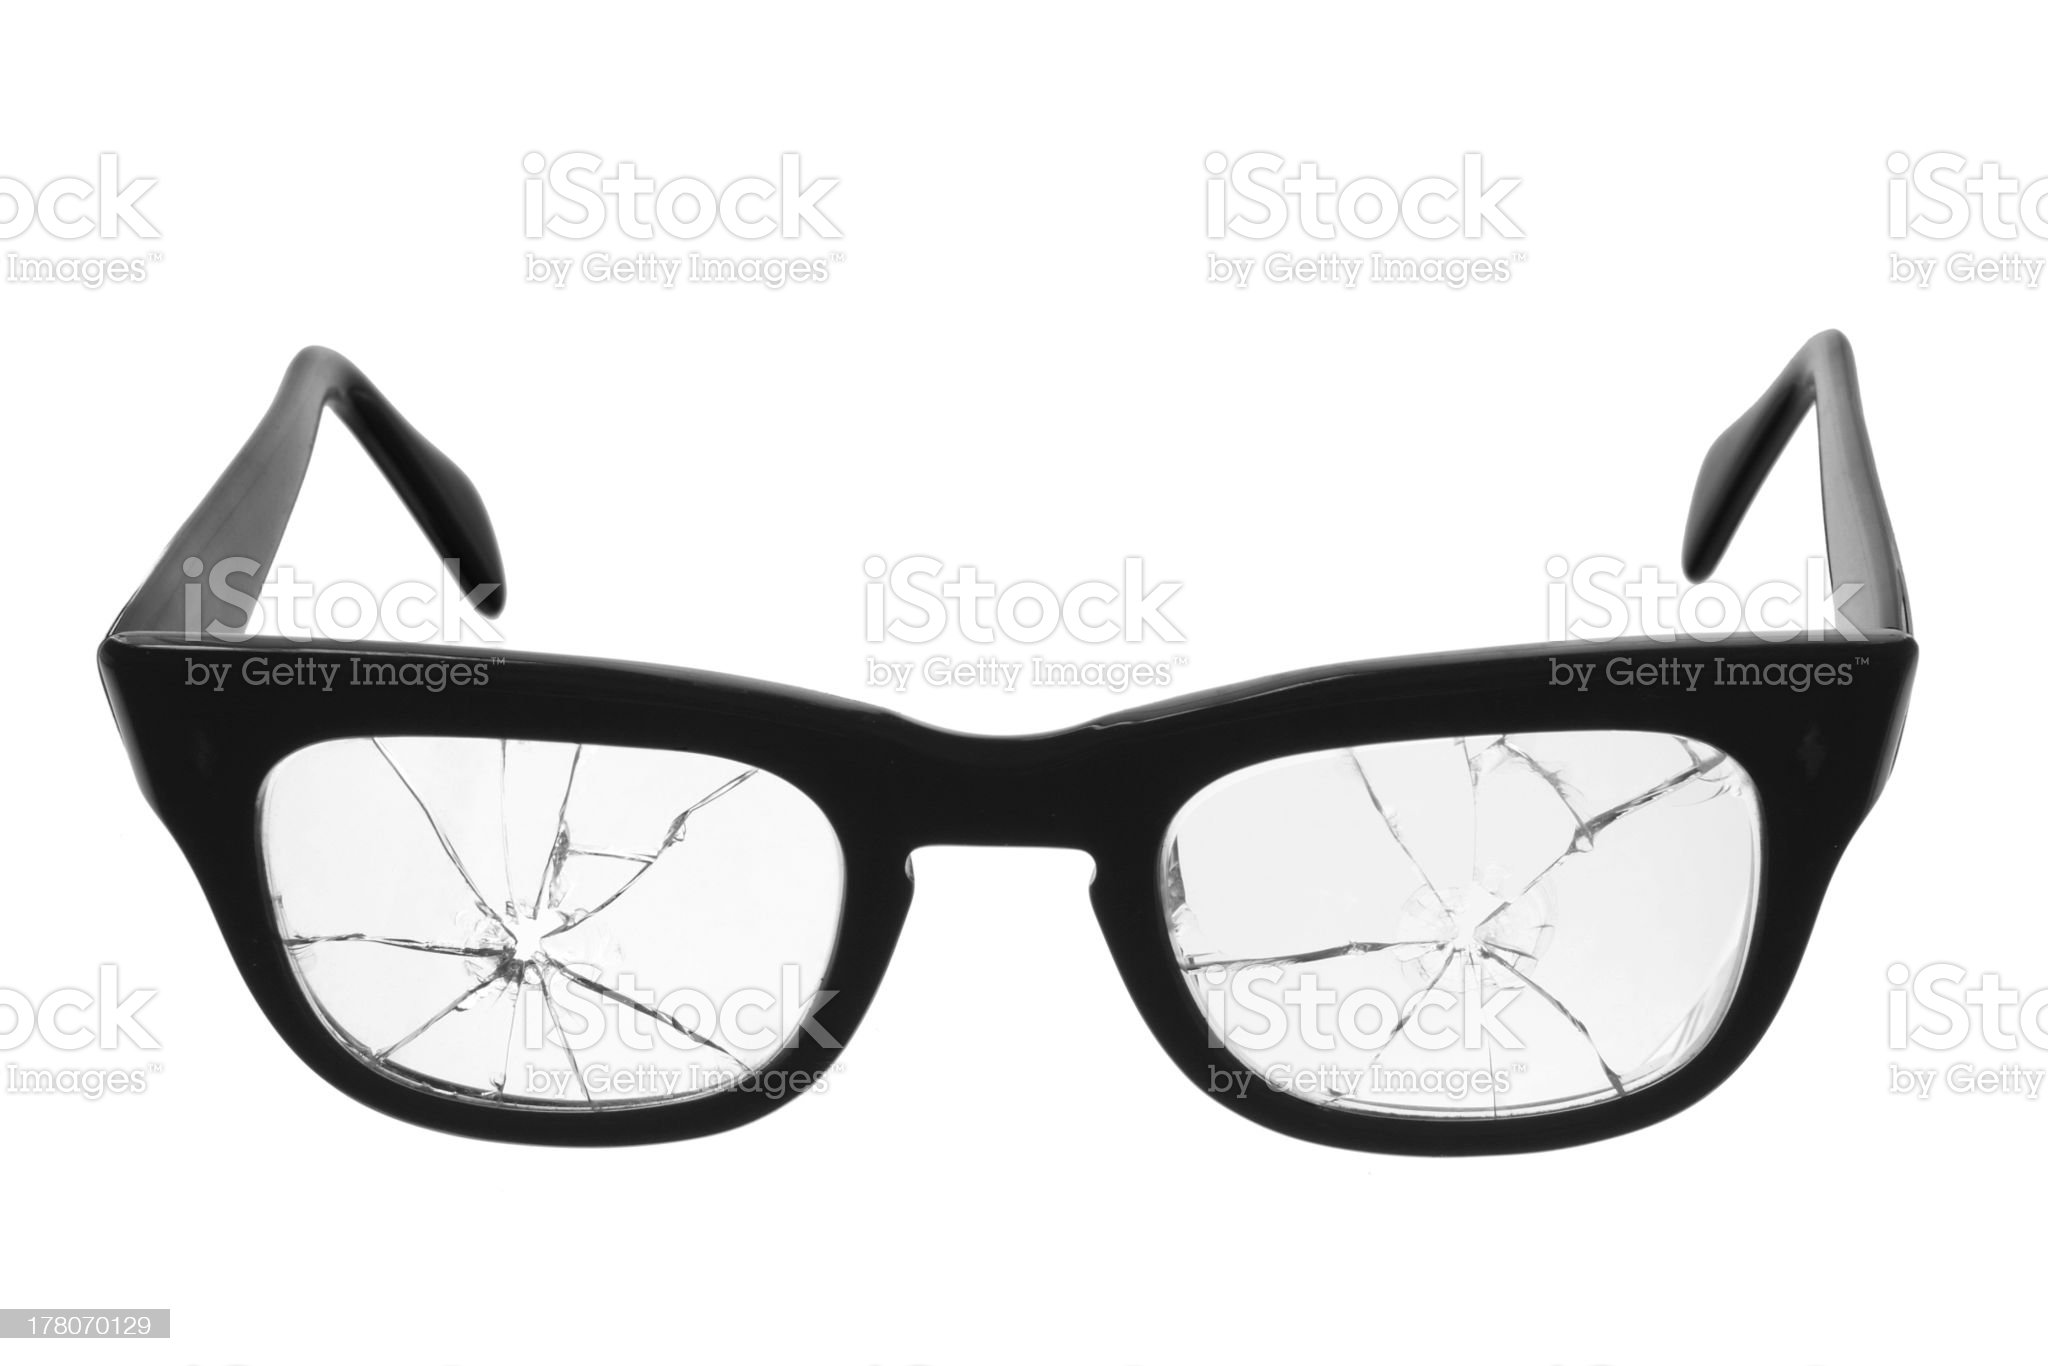 Broken Eyeglasses royalty-free stock photo